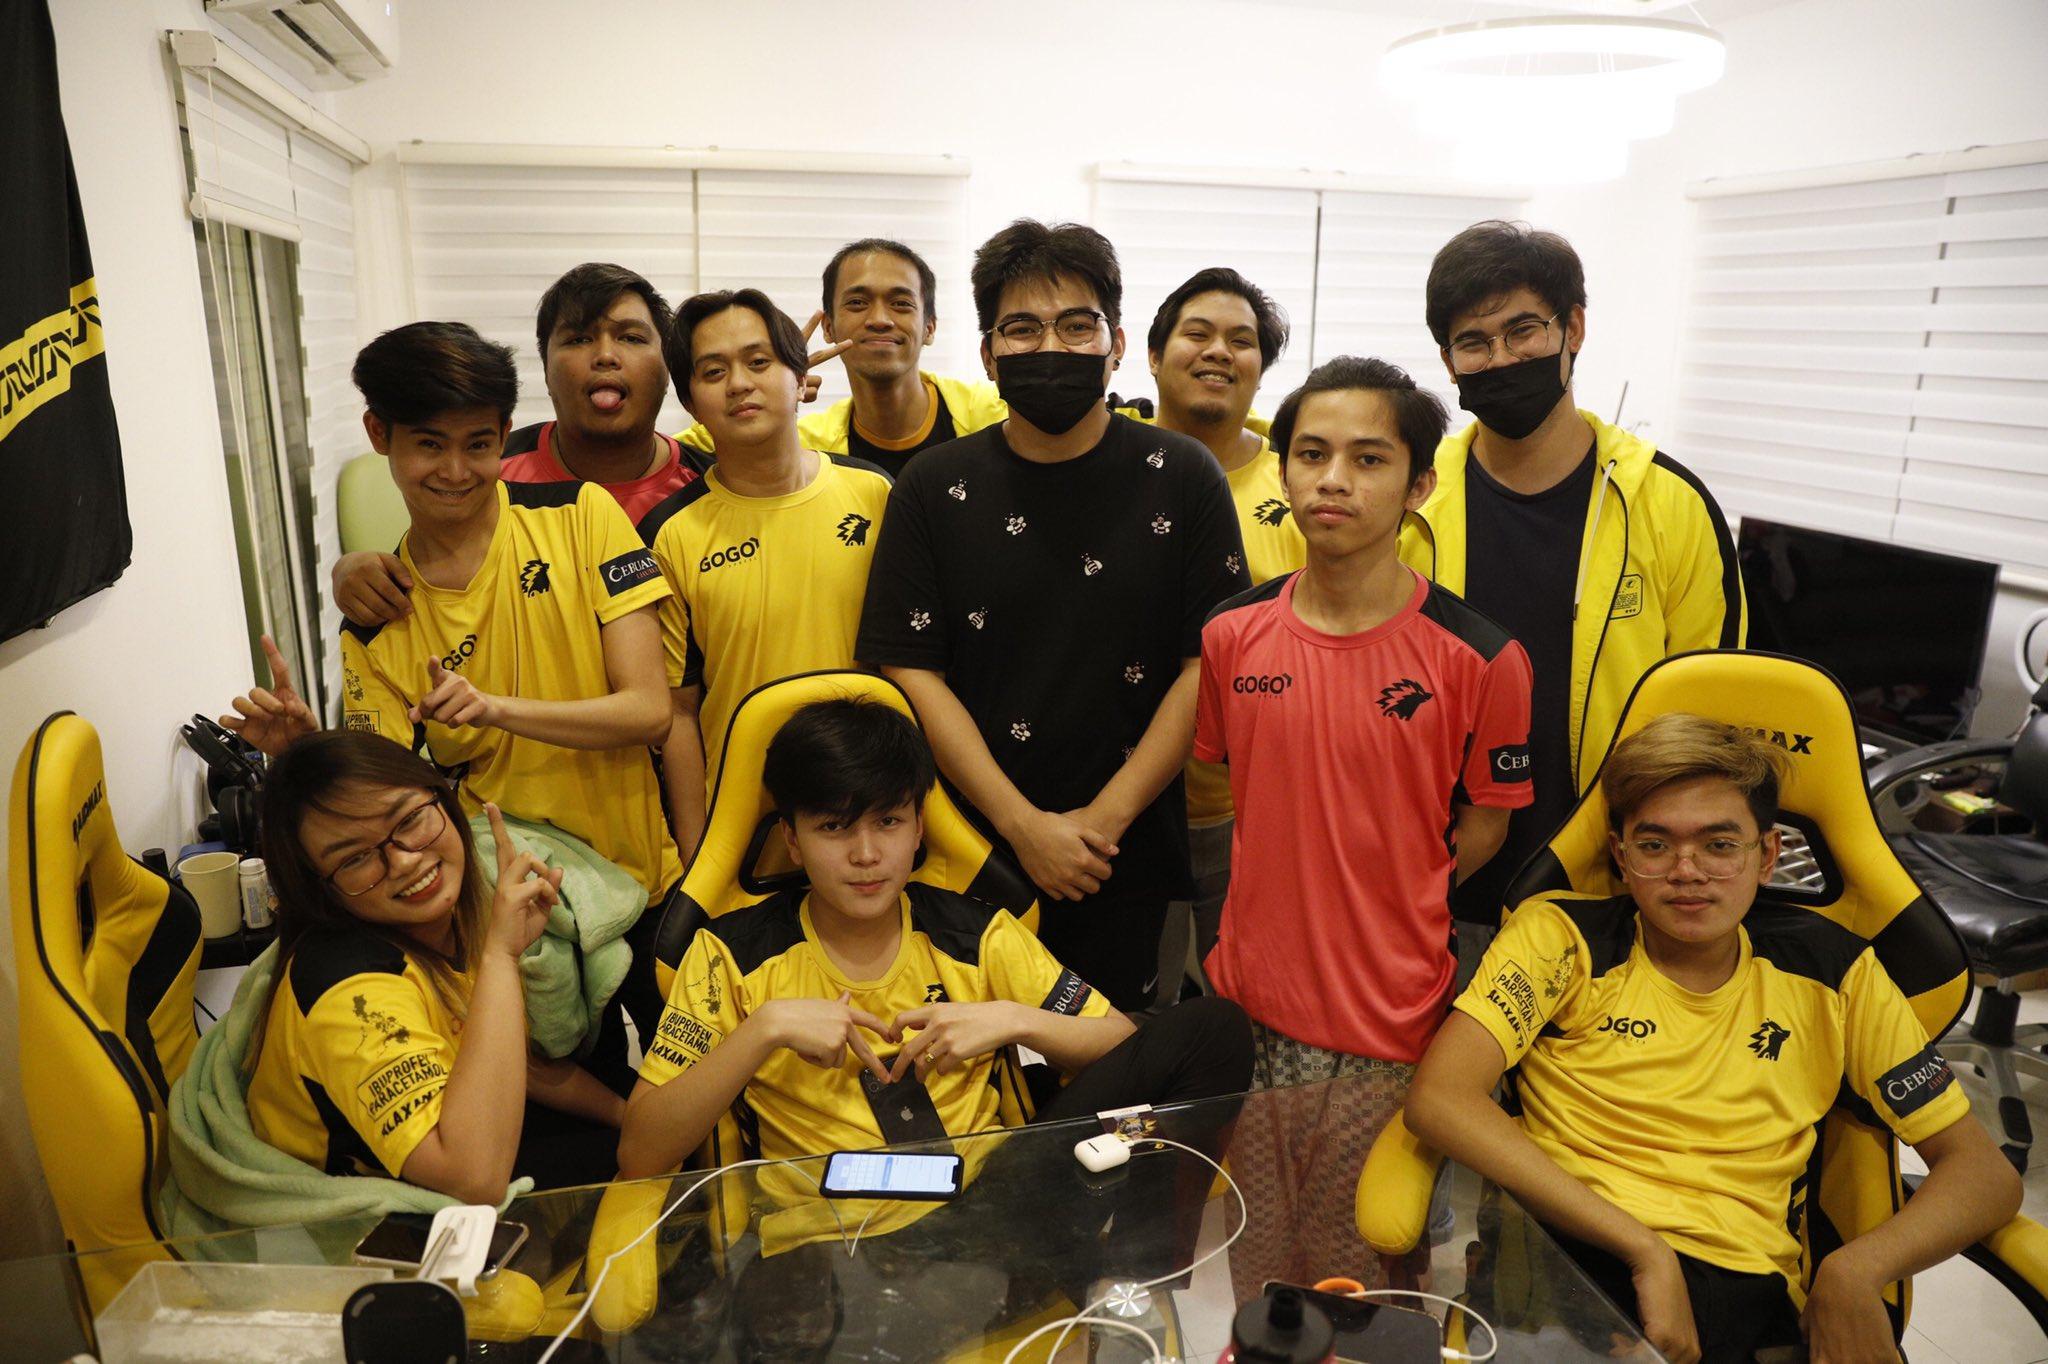 Onic PH team posing